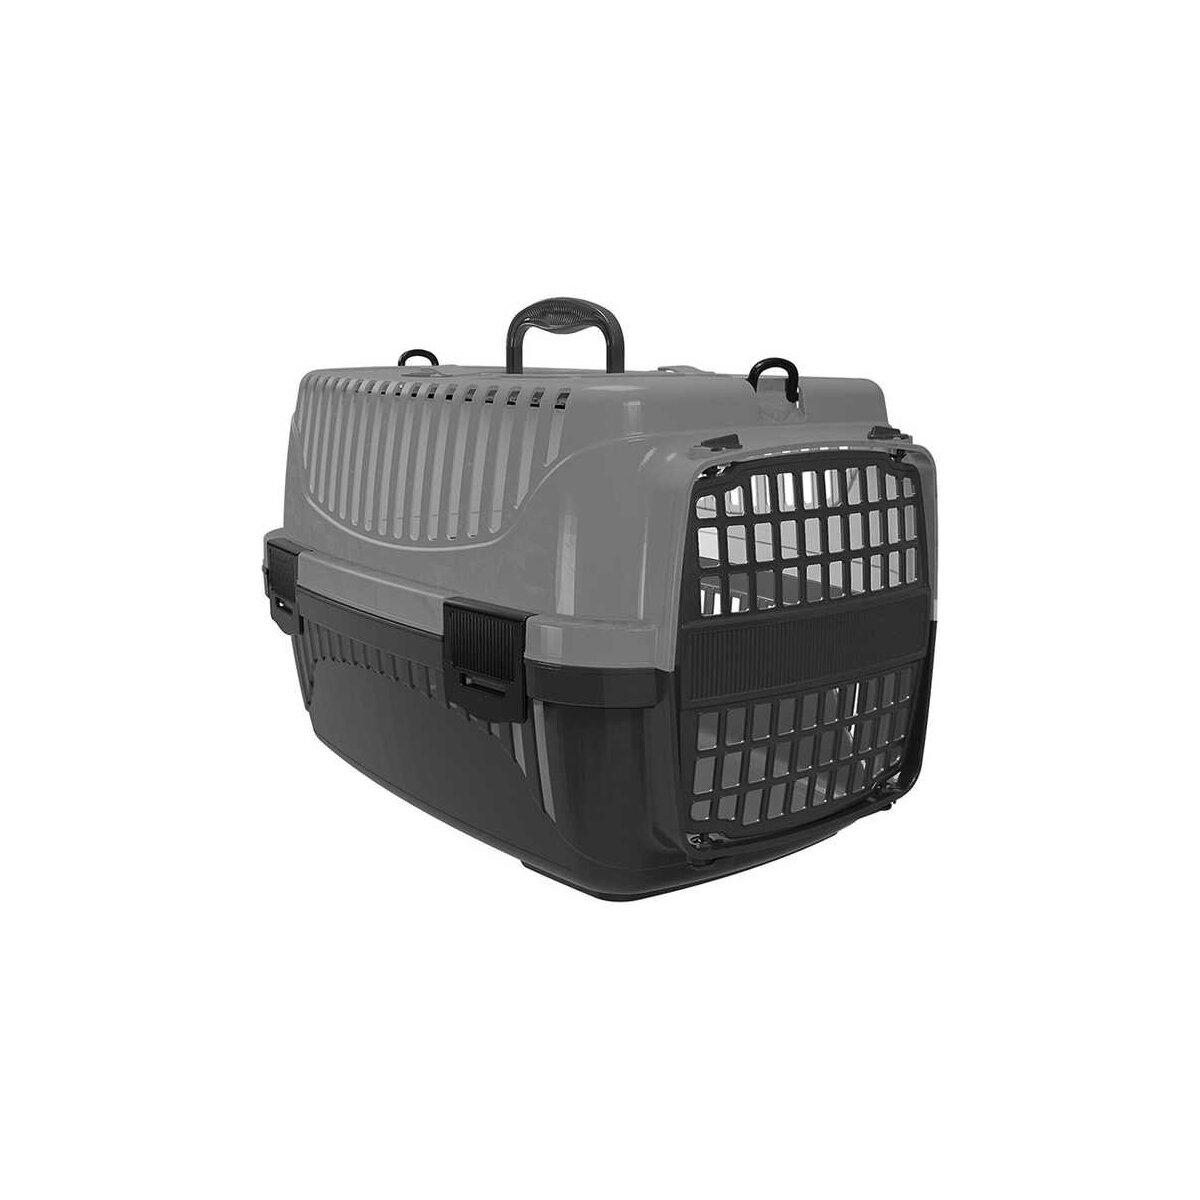 Plastart Pt-100 Evcil Hayvan Taşıma Çantası Gri Siyah